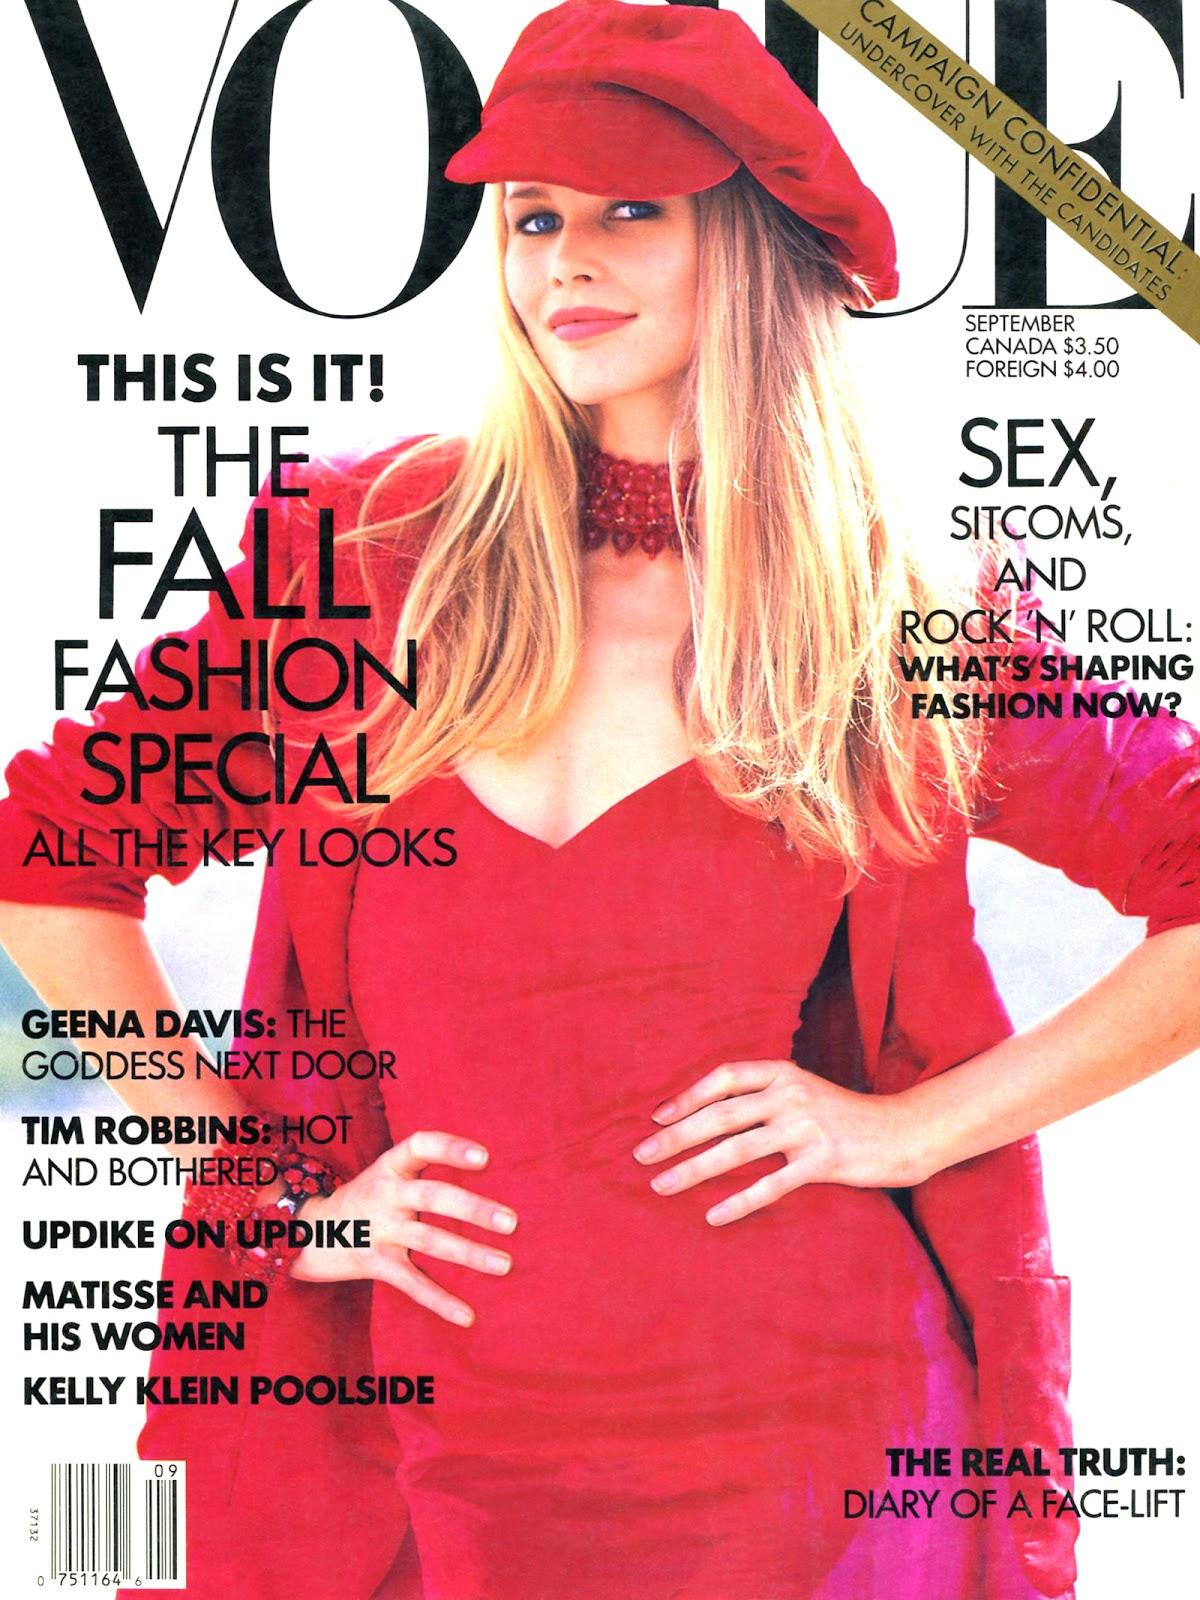 http://3.bp.blogspot.com/-gYklhGpUolk/UD-cw7Rt5kI/AAAAAAAAIxI/tRsrGI2QJQY/s1600/1992+09+Vogue+Us+Ph+Arthur+Elgort+001+Claudia+Schiffer.jpg